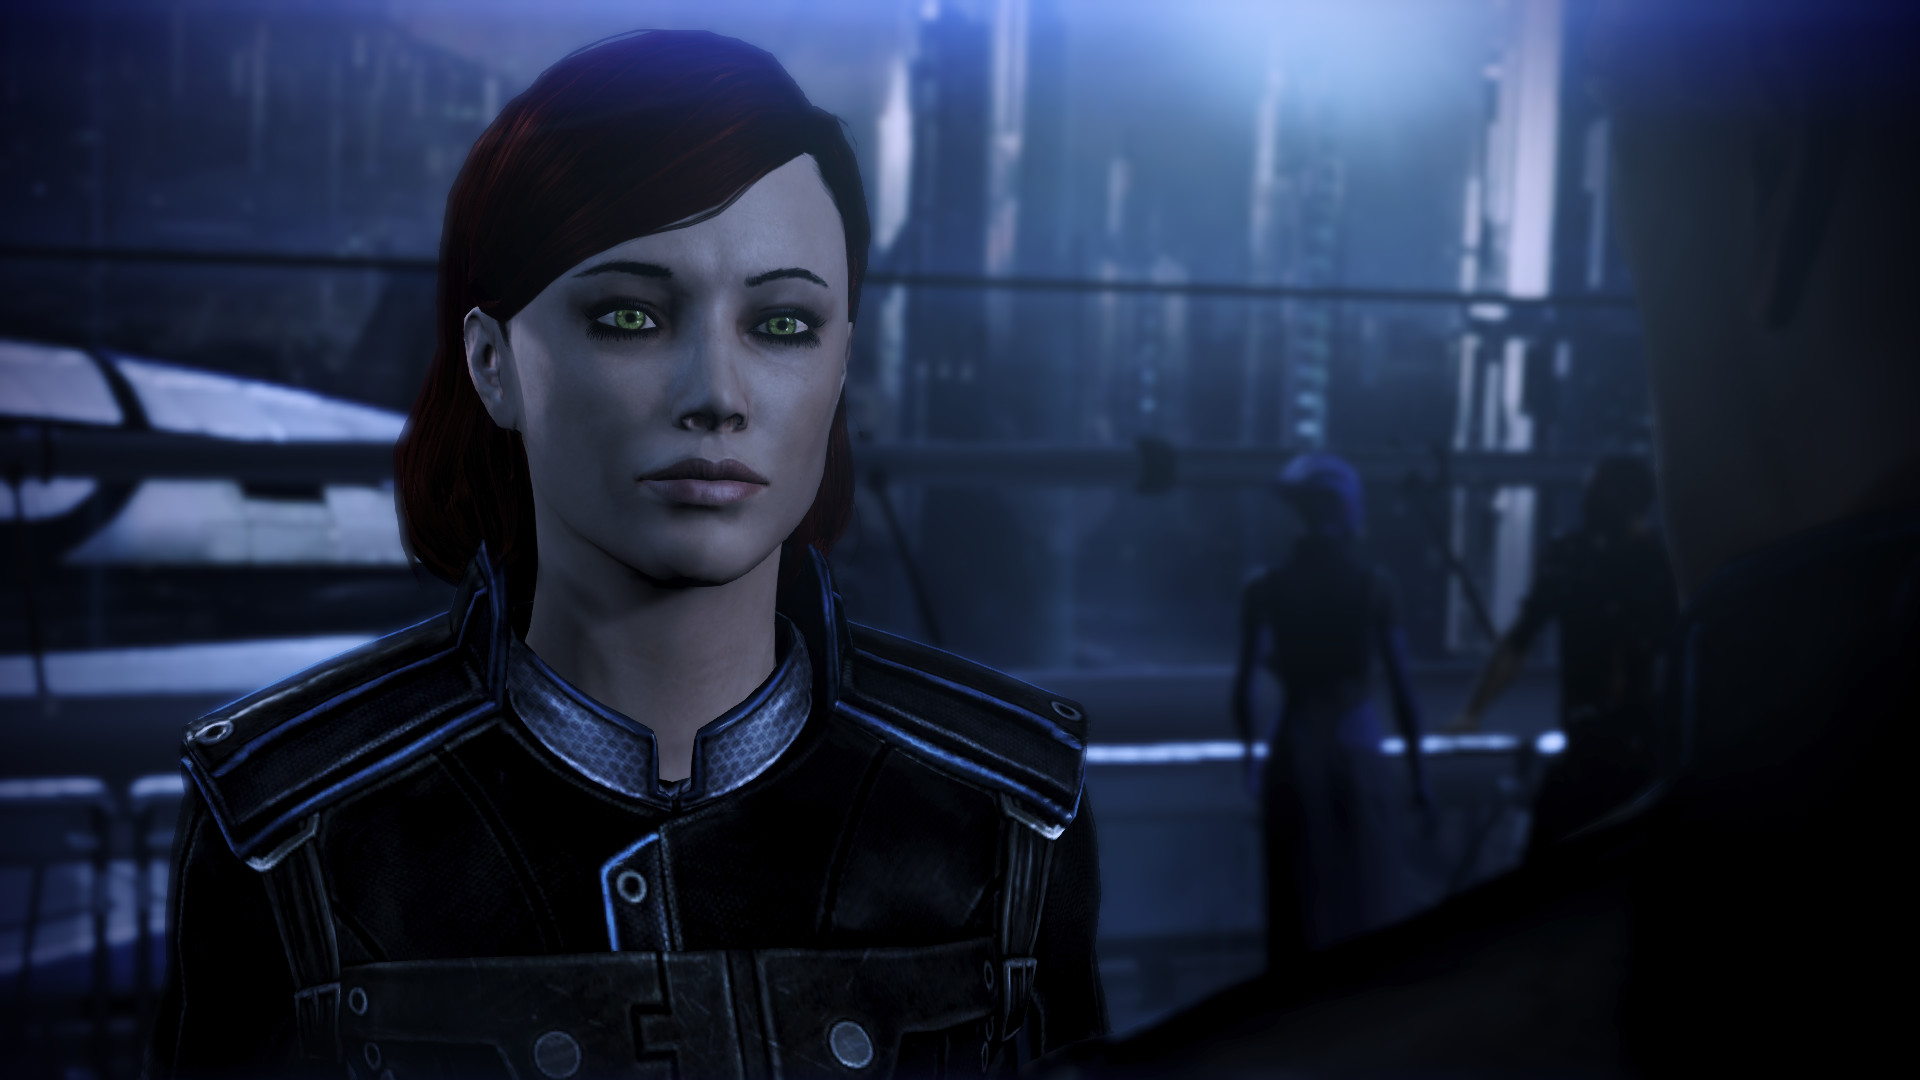 FemShep Mass Effect 3 by Usmovers02 FemShep Mass Effect 3 by Usmovers02